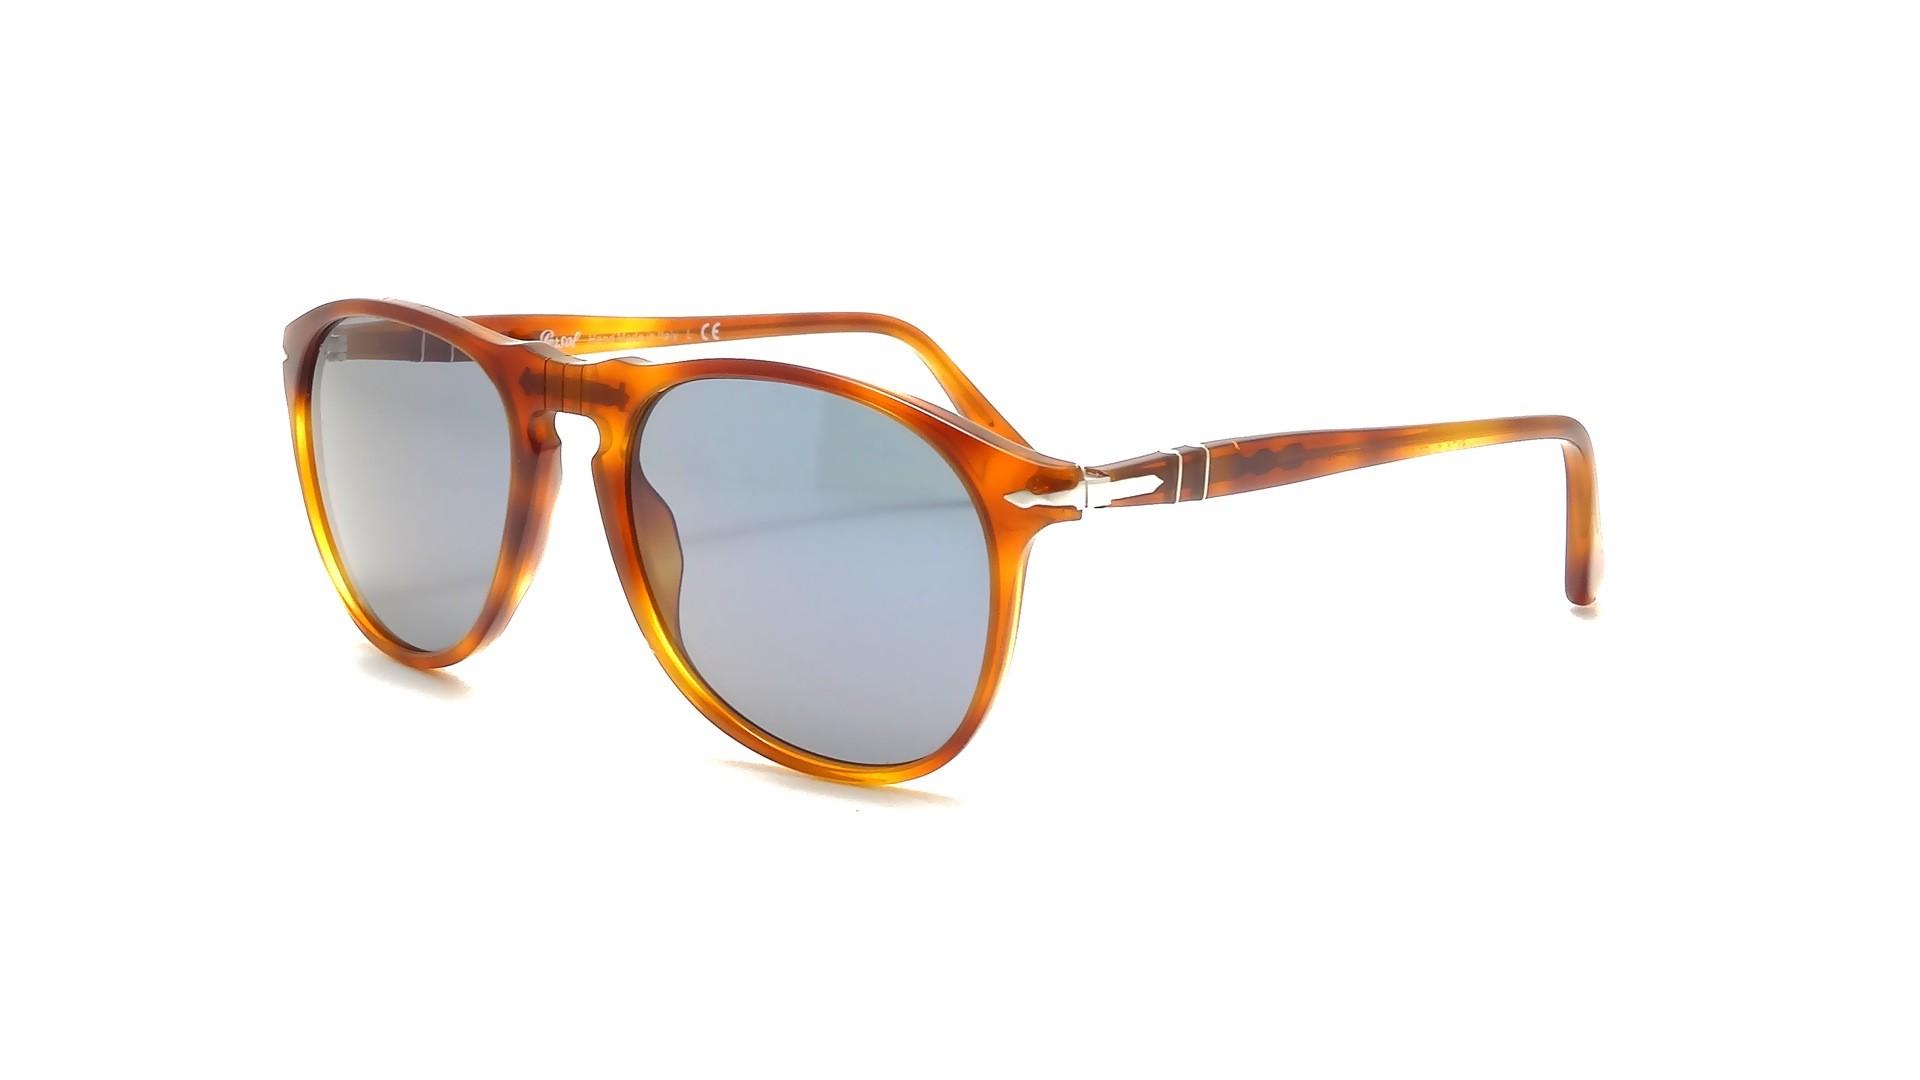 12f41e5eba2 Sunglasses Persol PO9649S 96 56 52-18 Terra di Siena Tortoise Medium